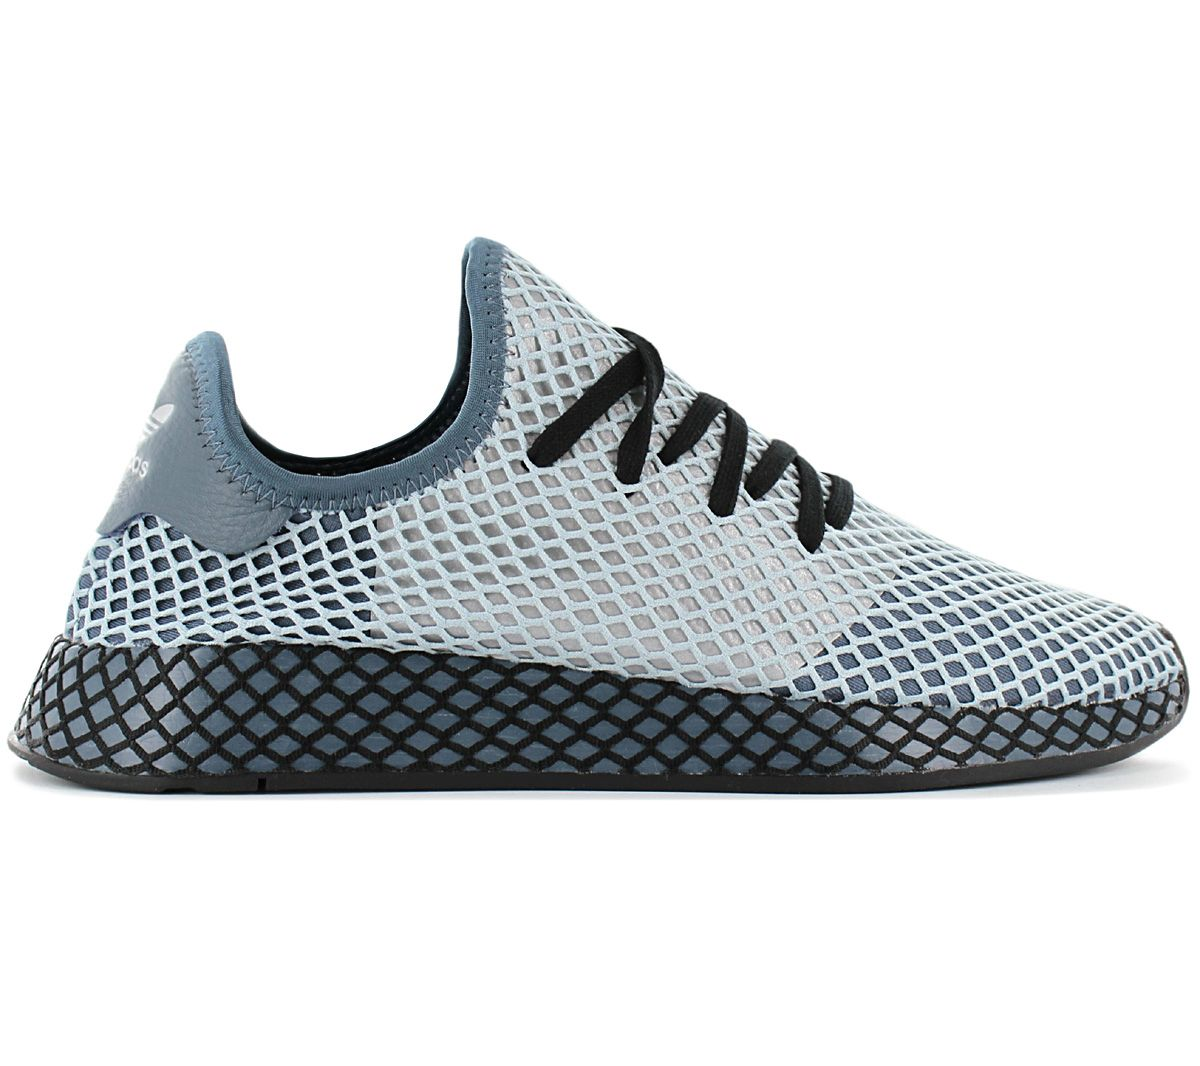 Sneaker EG5354 Leisure Sports Shoes